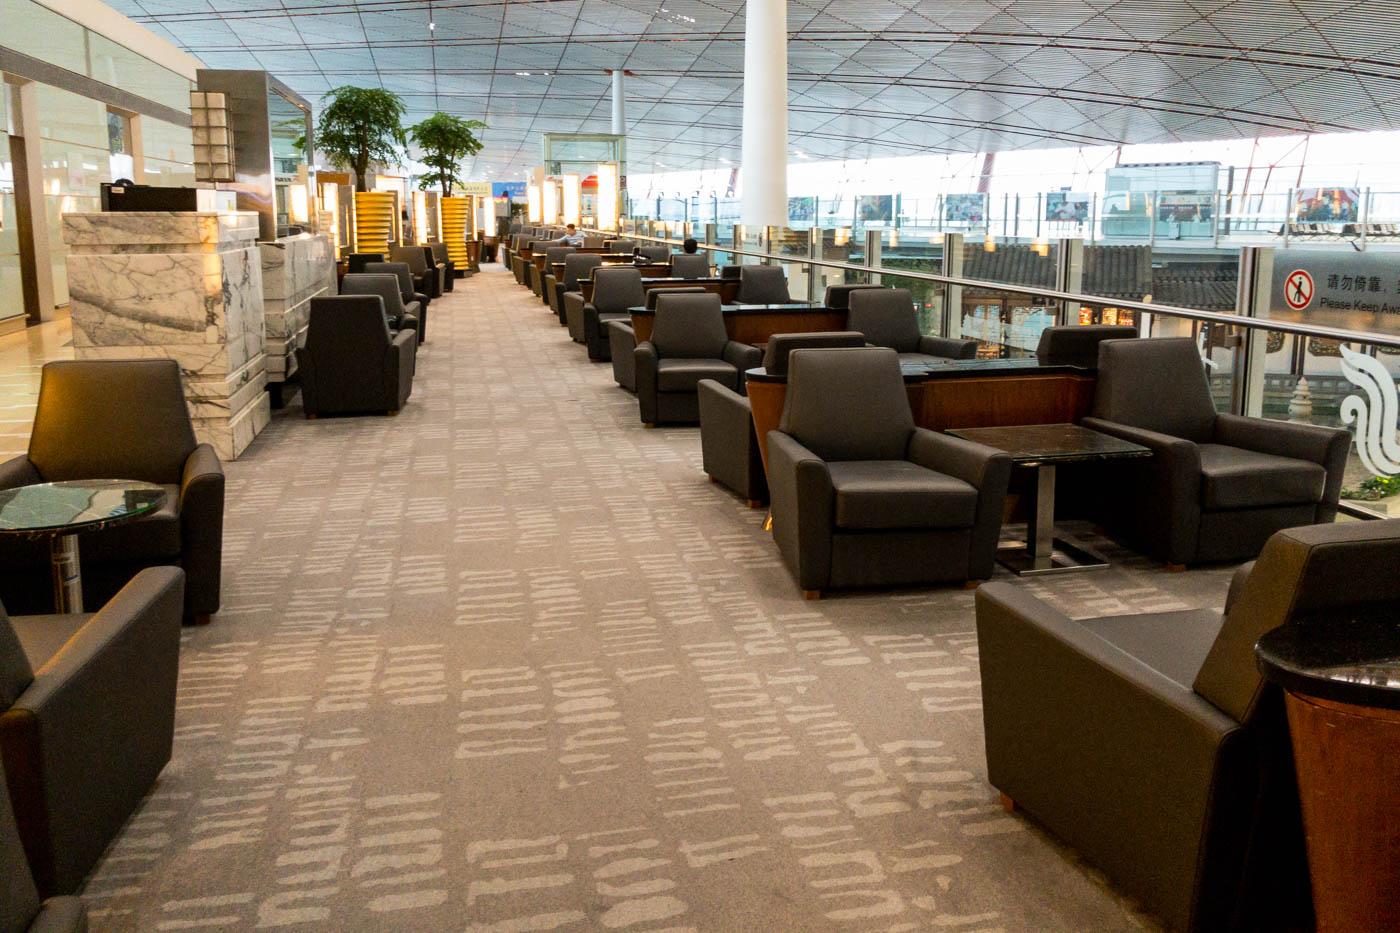 Air China Business Class Lounge Terminal 3E at Beijing Capital